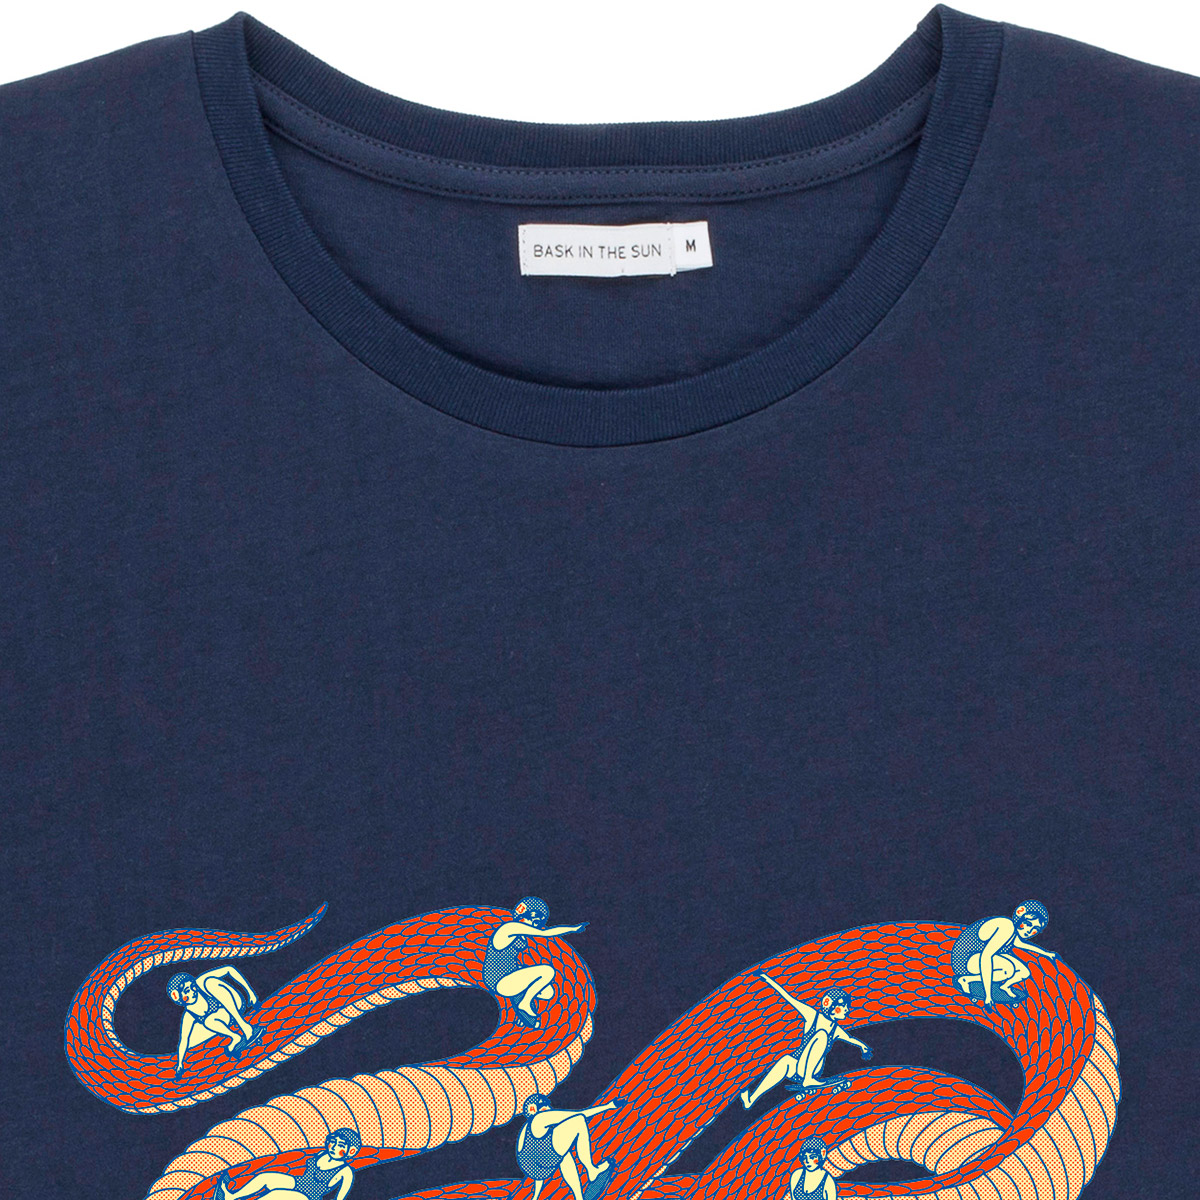 T-shirt en coton bio navy snakepark - Bask in the Sun num 2